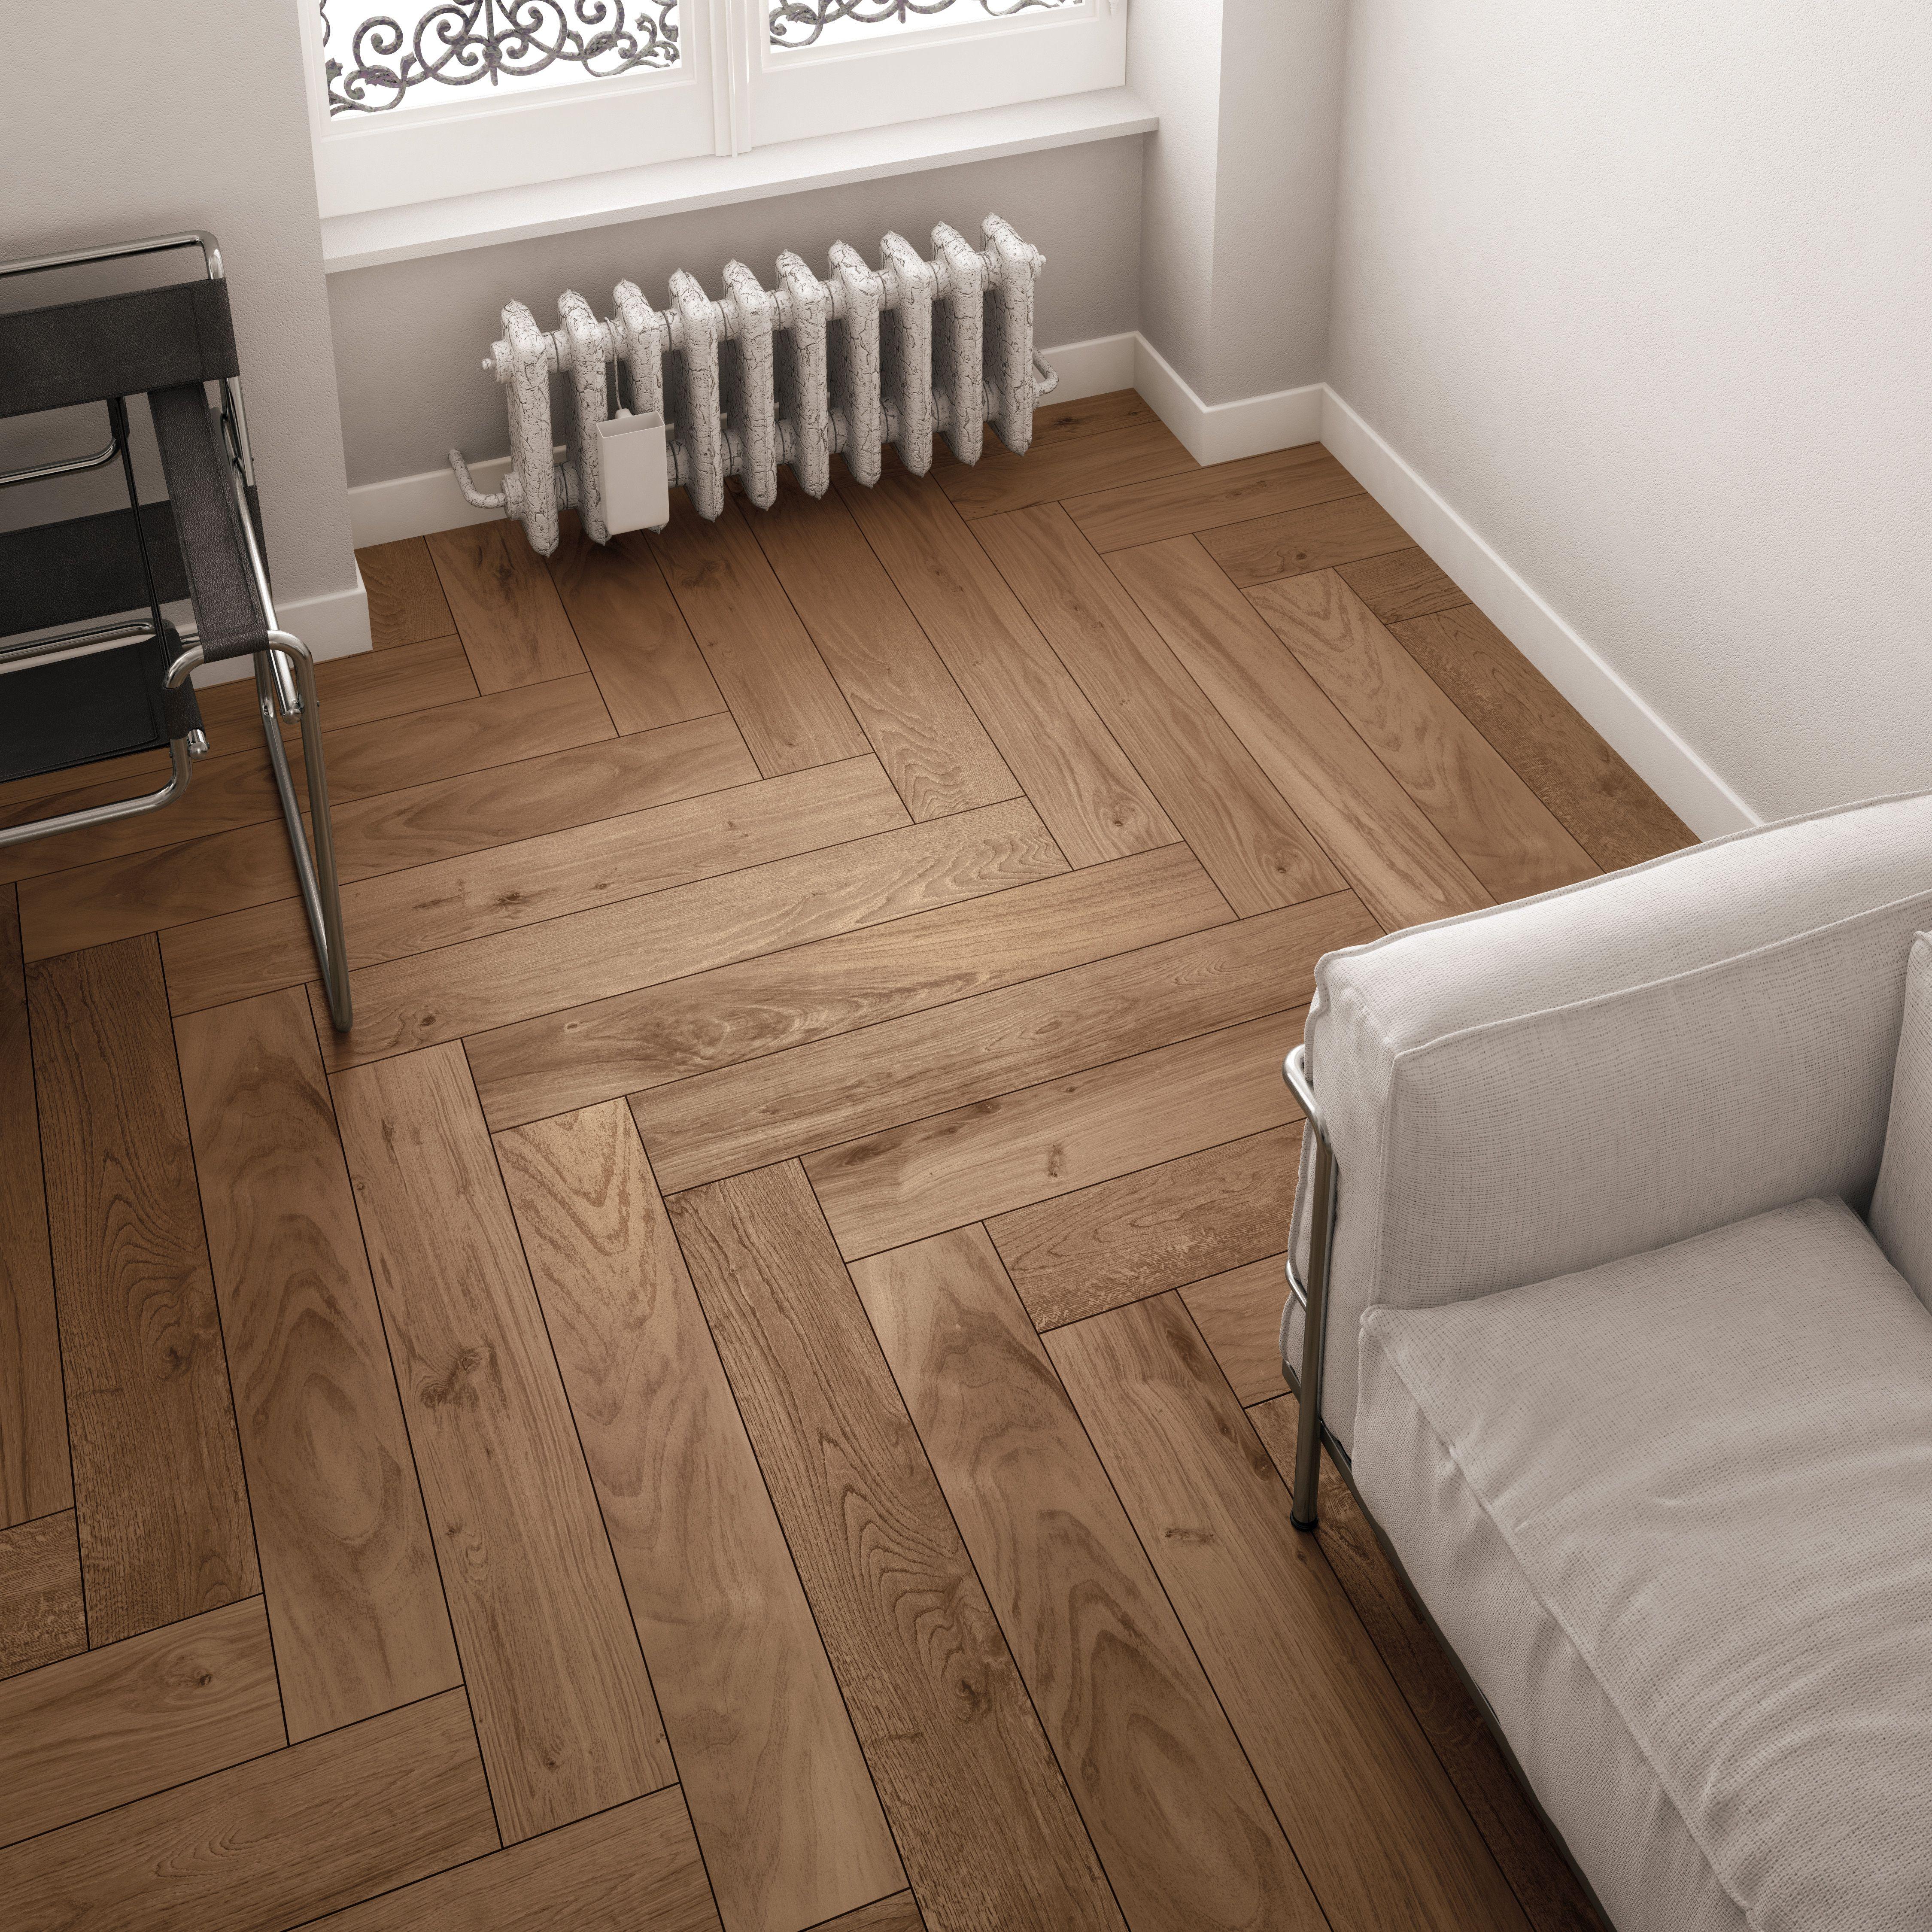 italian ceramics tiles ceramiche marca corona italy luxury vinyl plank flooring flooring inspiration herringbone wood floor